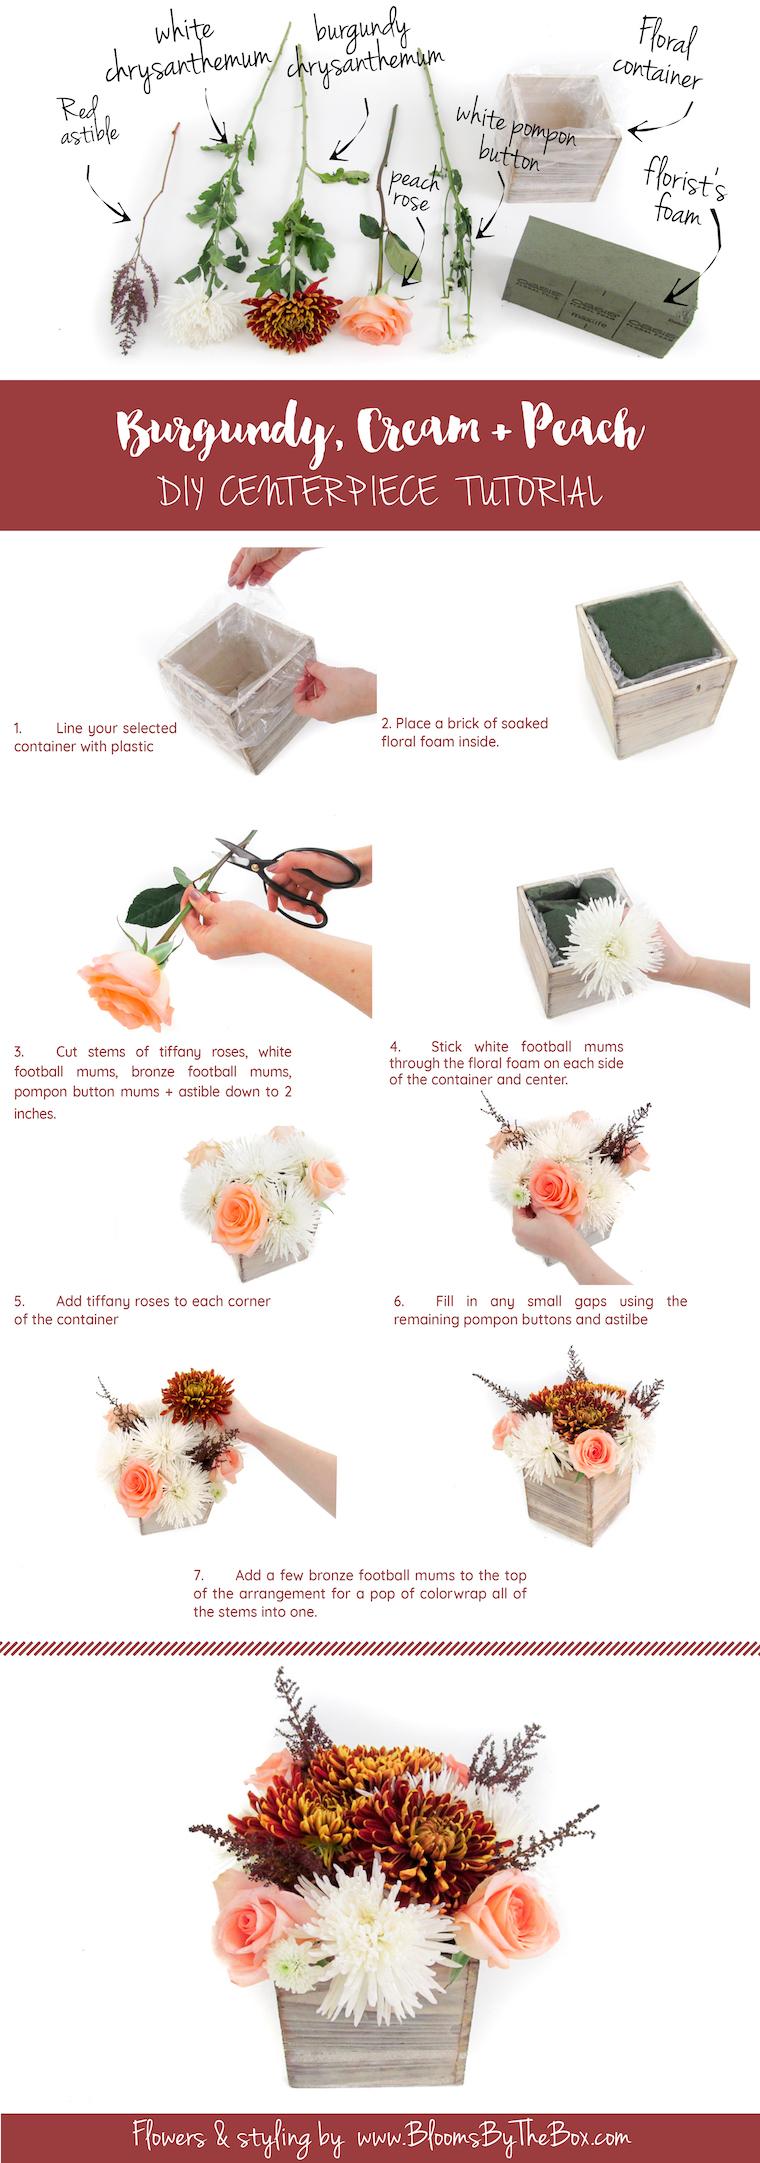 Burgundy and cream diy wedding centerpiece tutorial